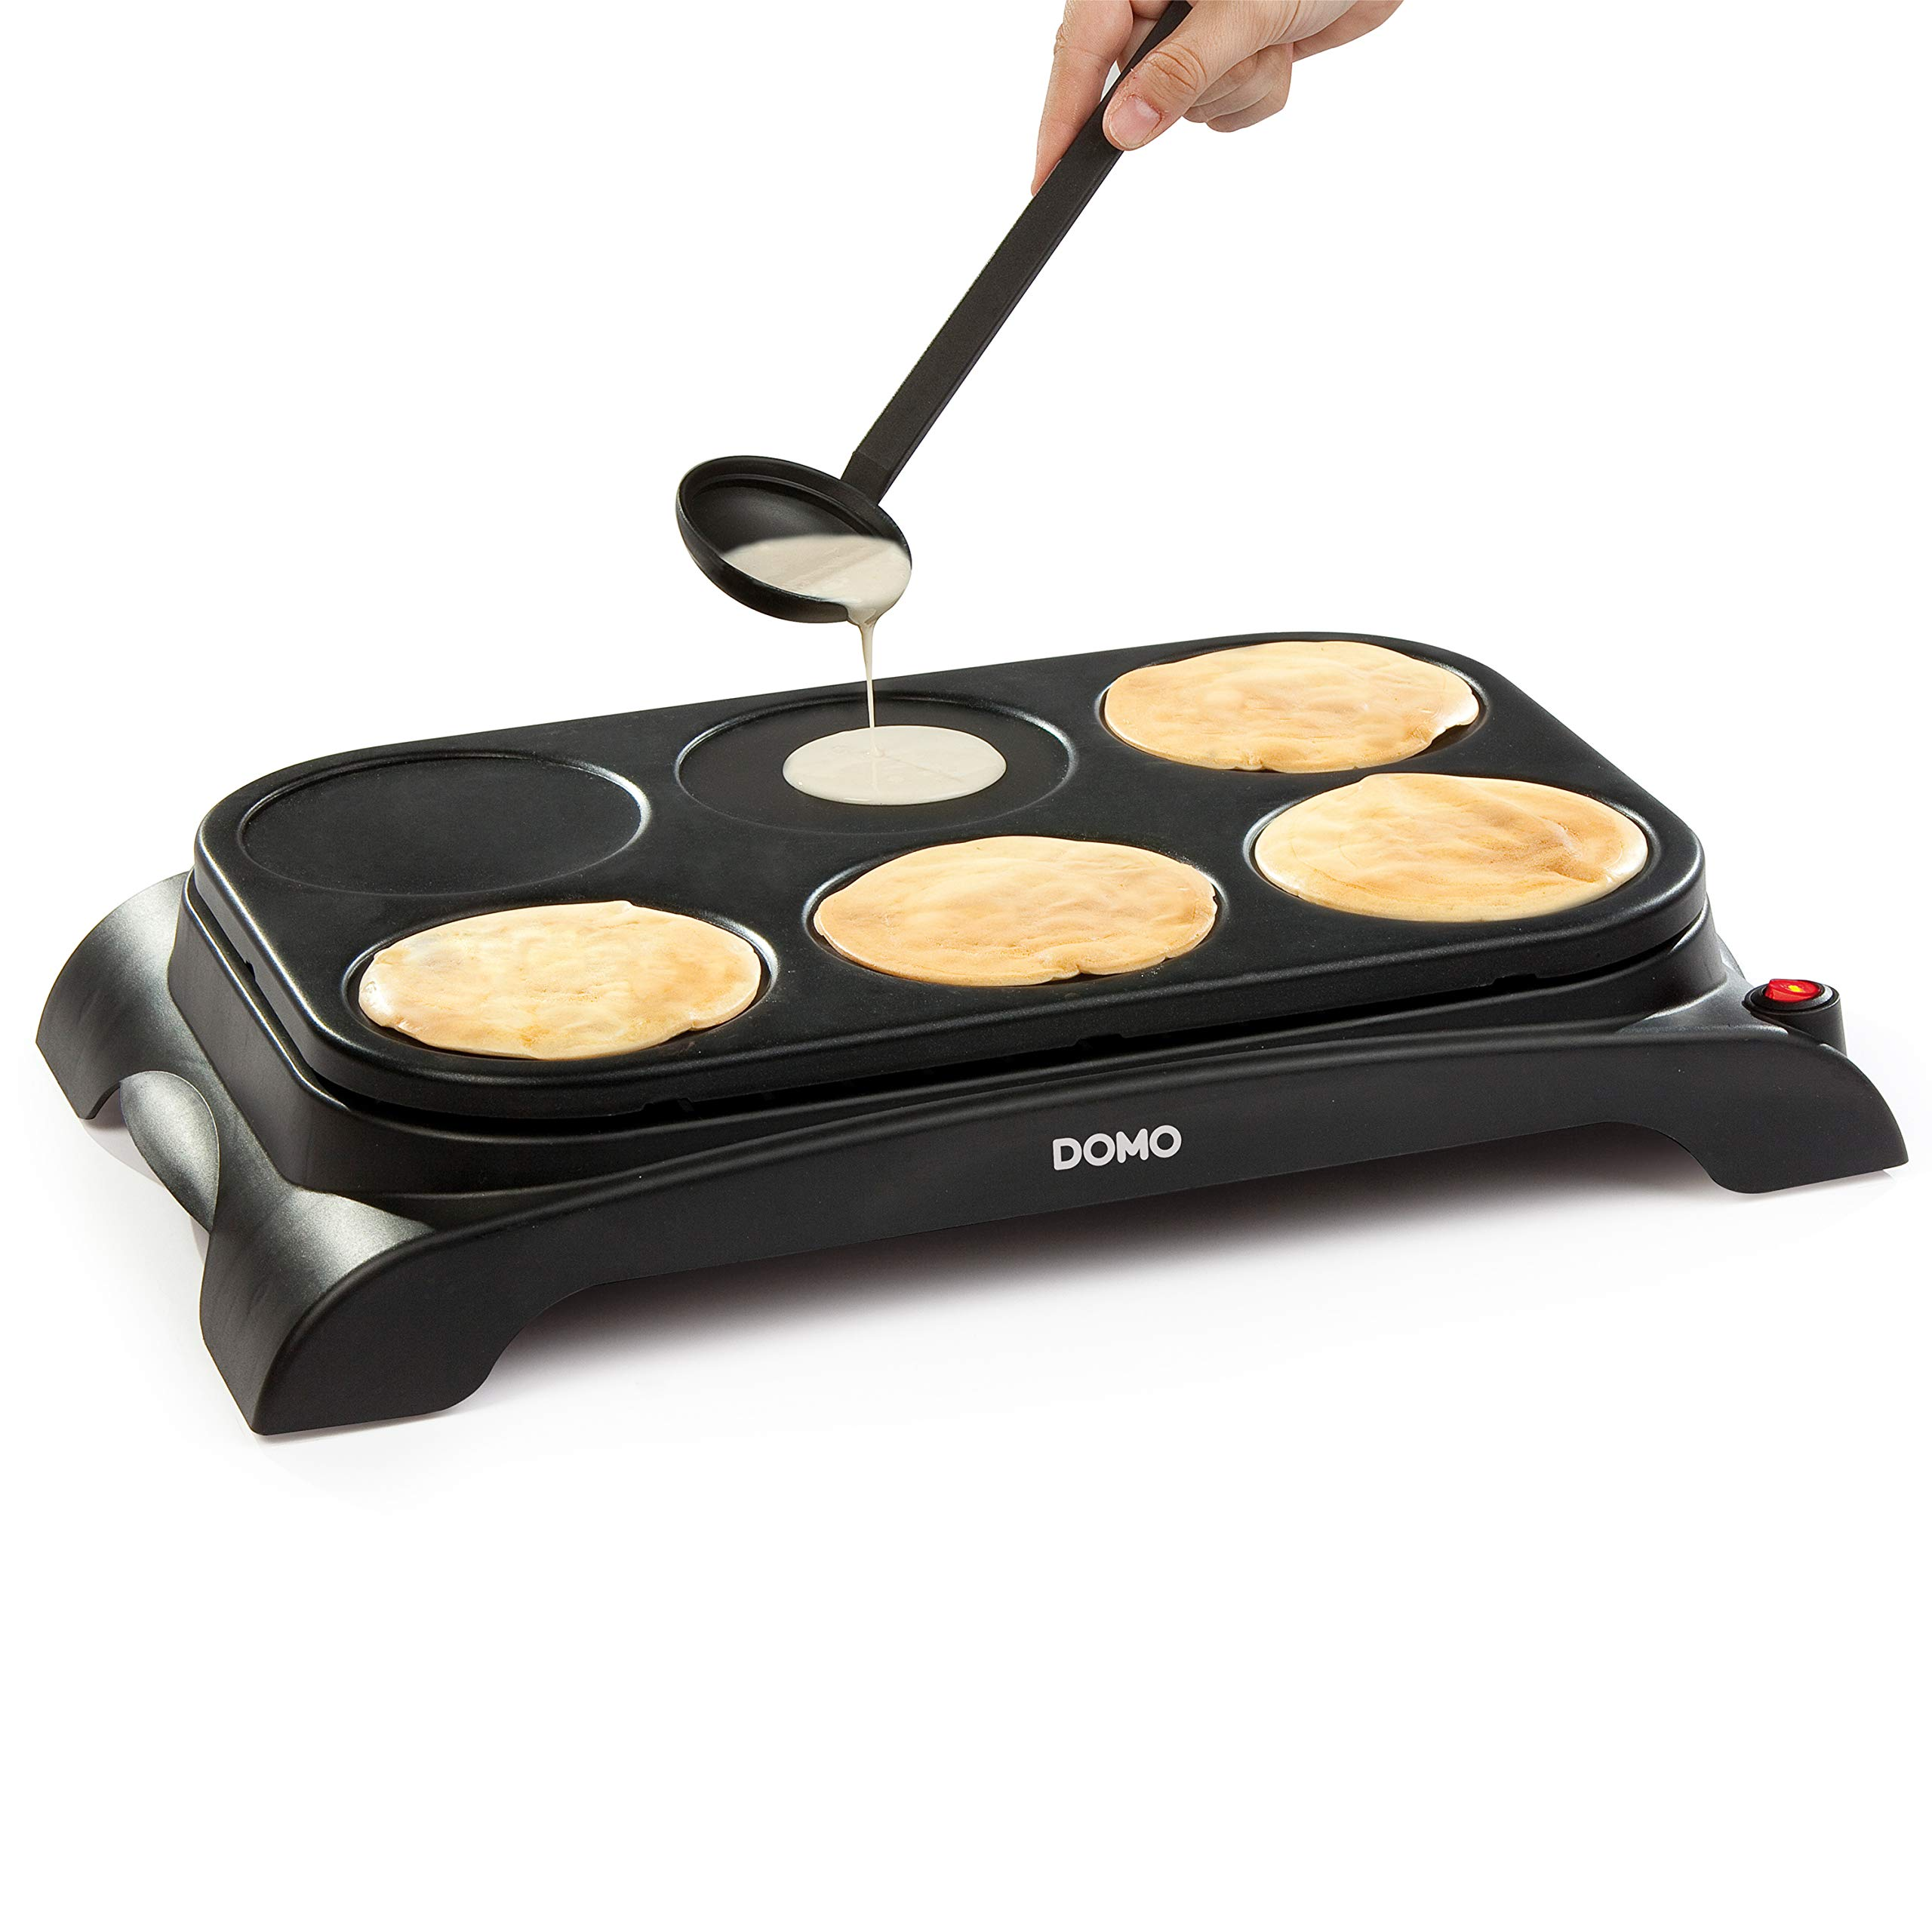 Domo DO8709P Pancake/Crepe Maker, Plastic, 1000 W, Black